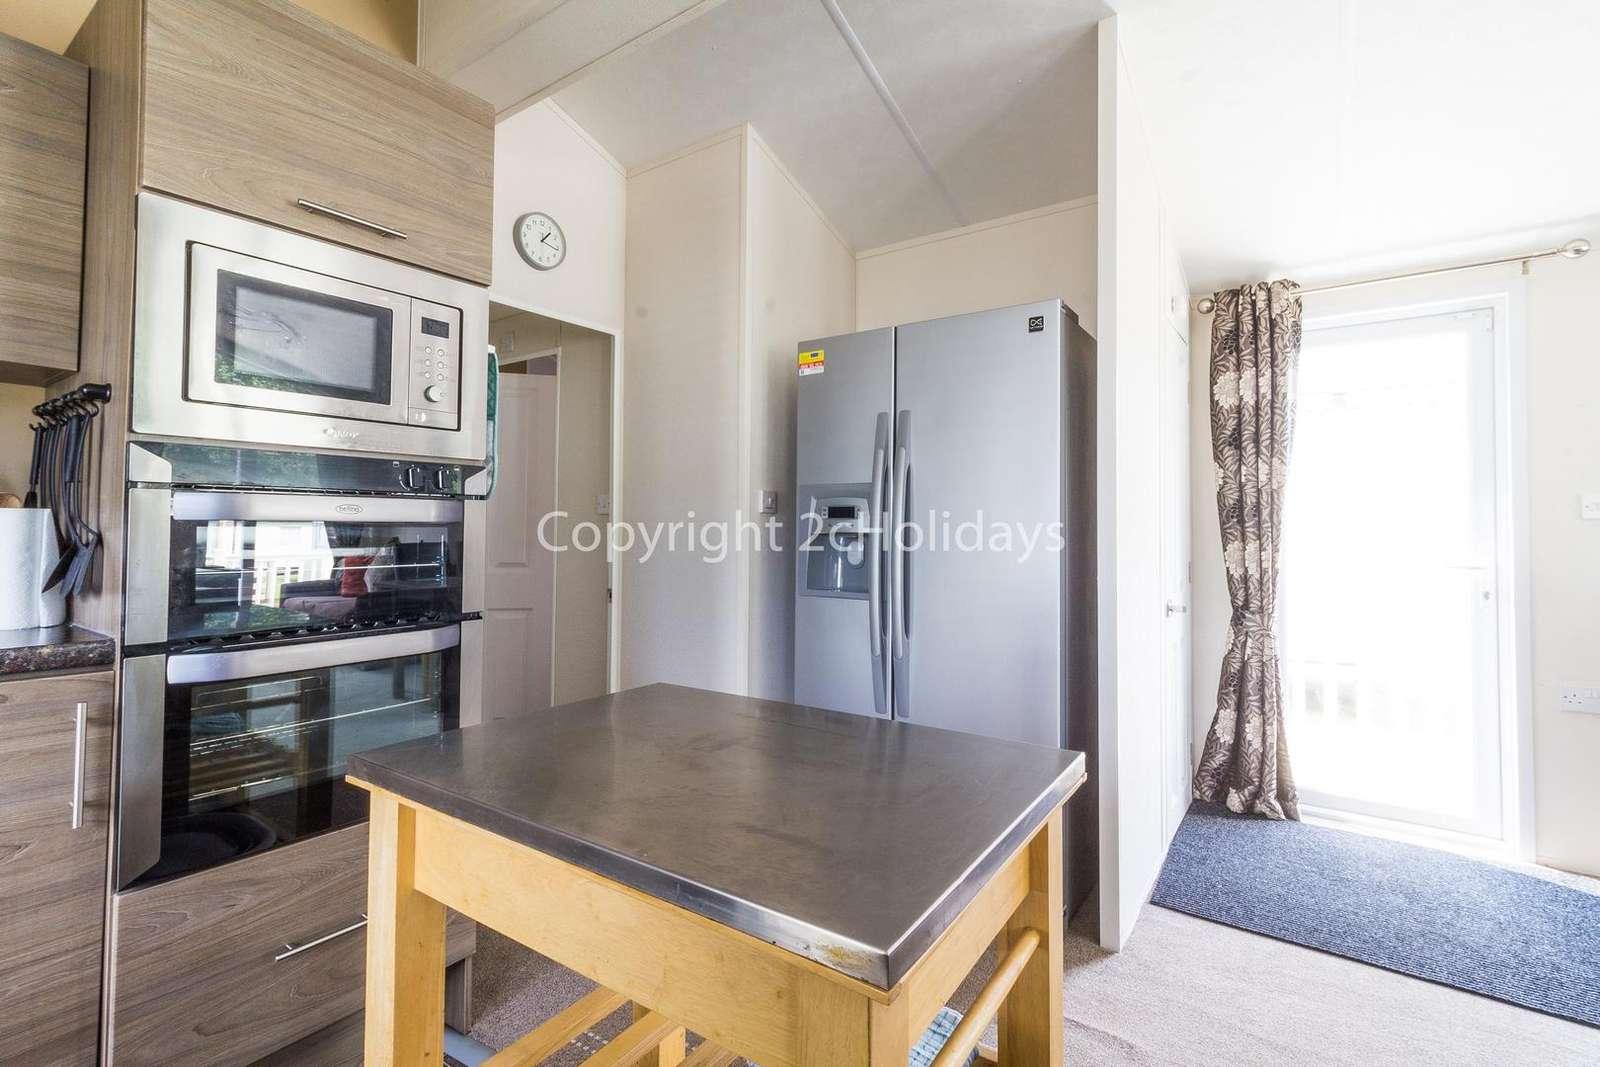 Superb kitchen with a dishwasher, washing machine and wine cooler!